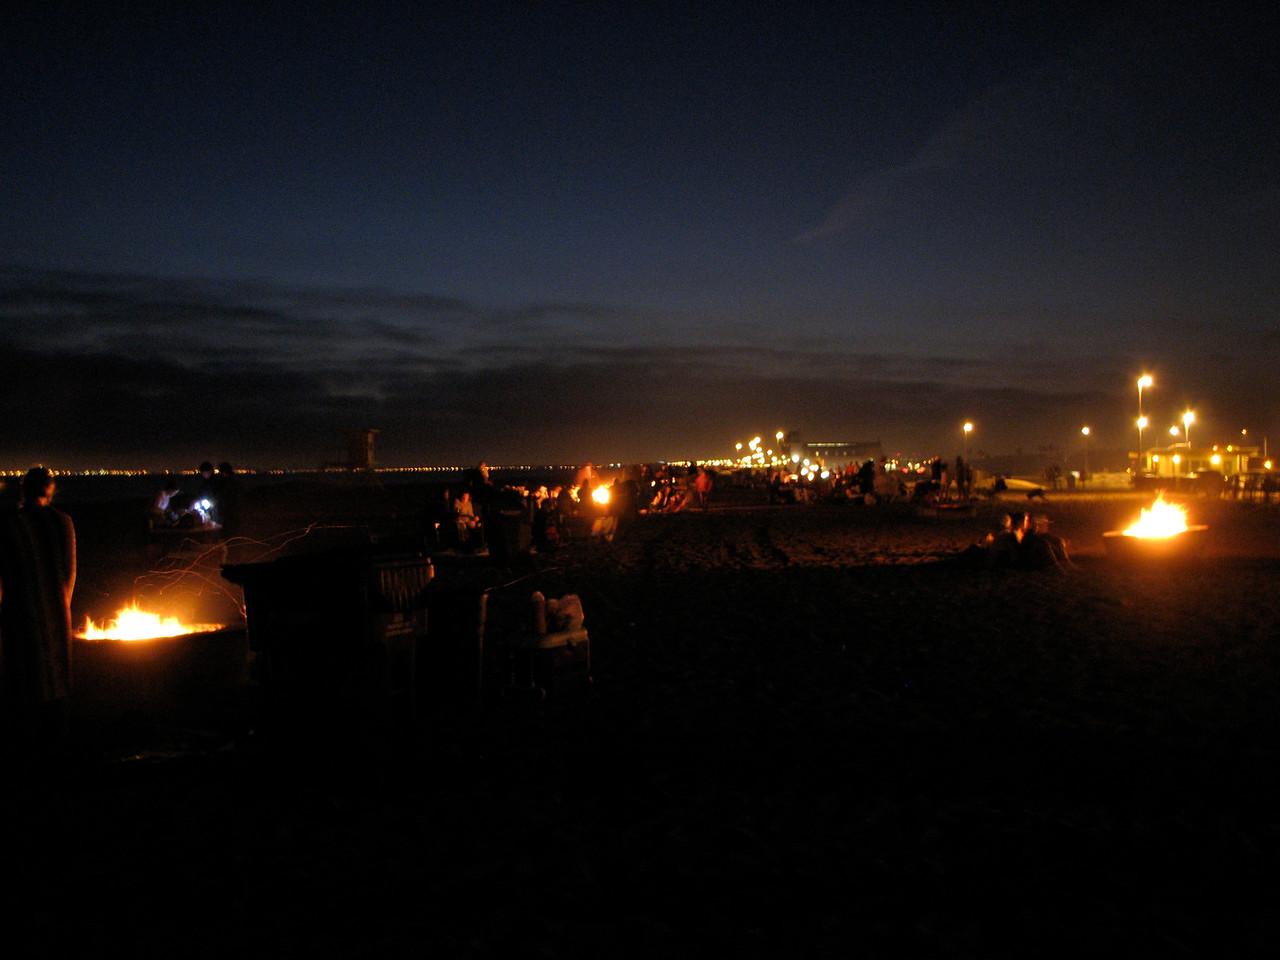 2007 06 22 Fri - Beach of bonfires